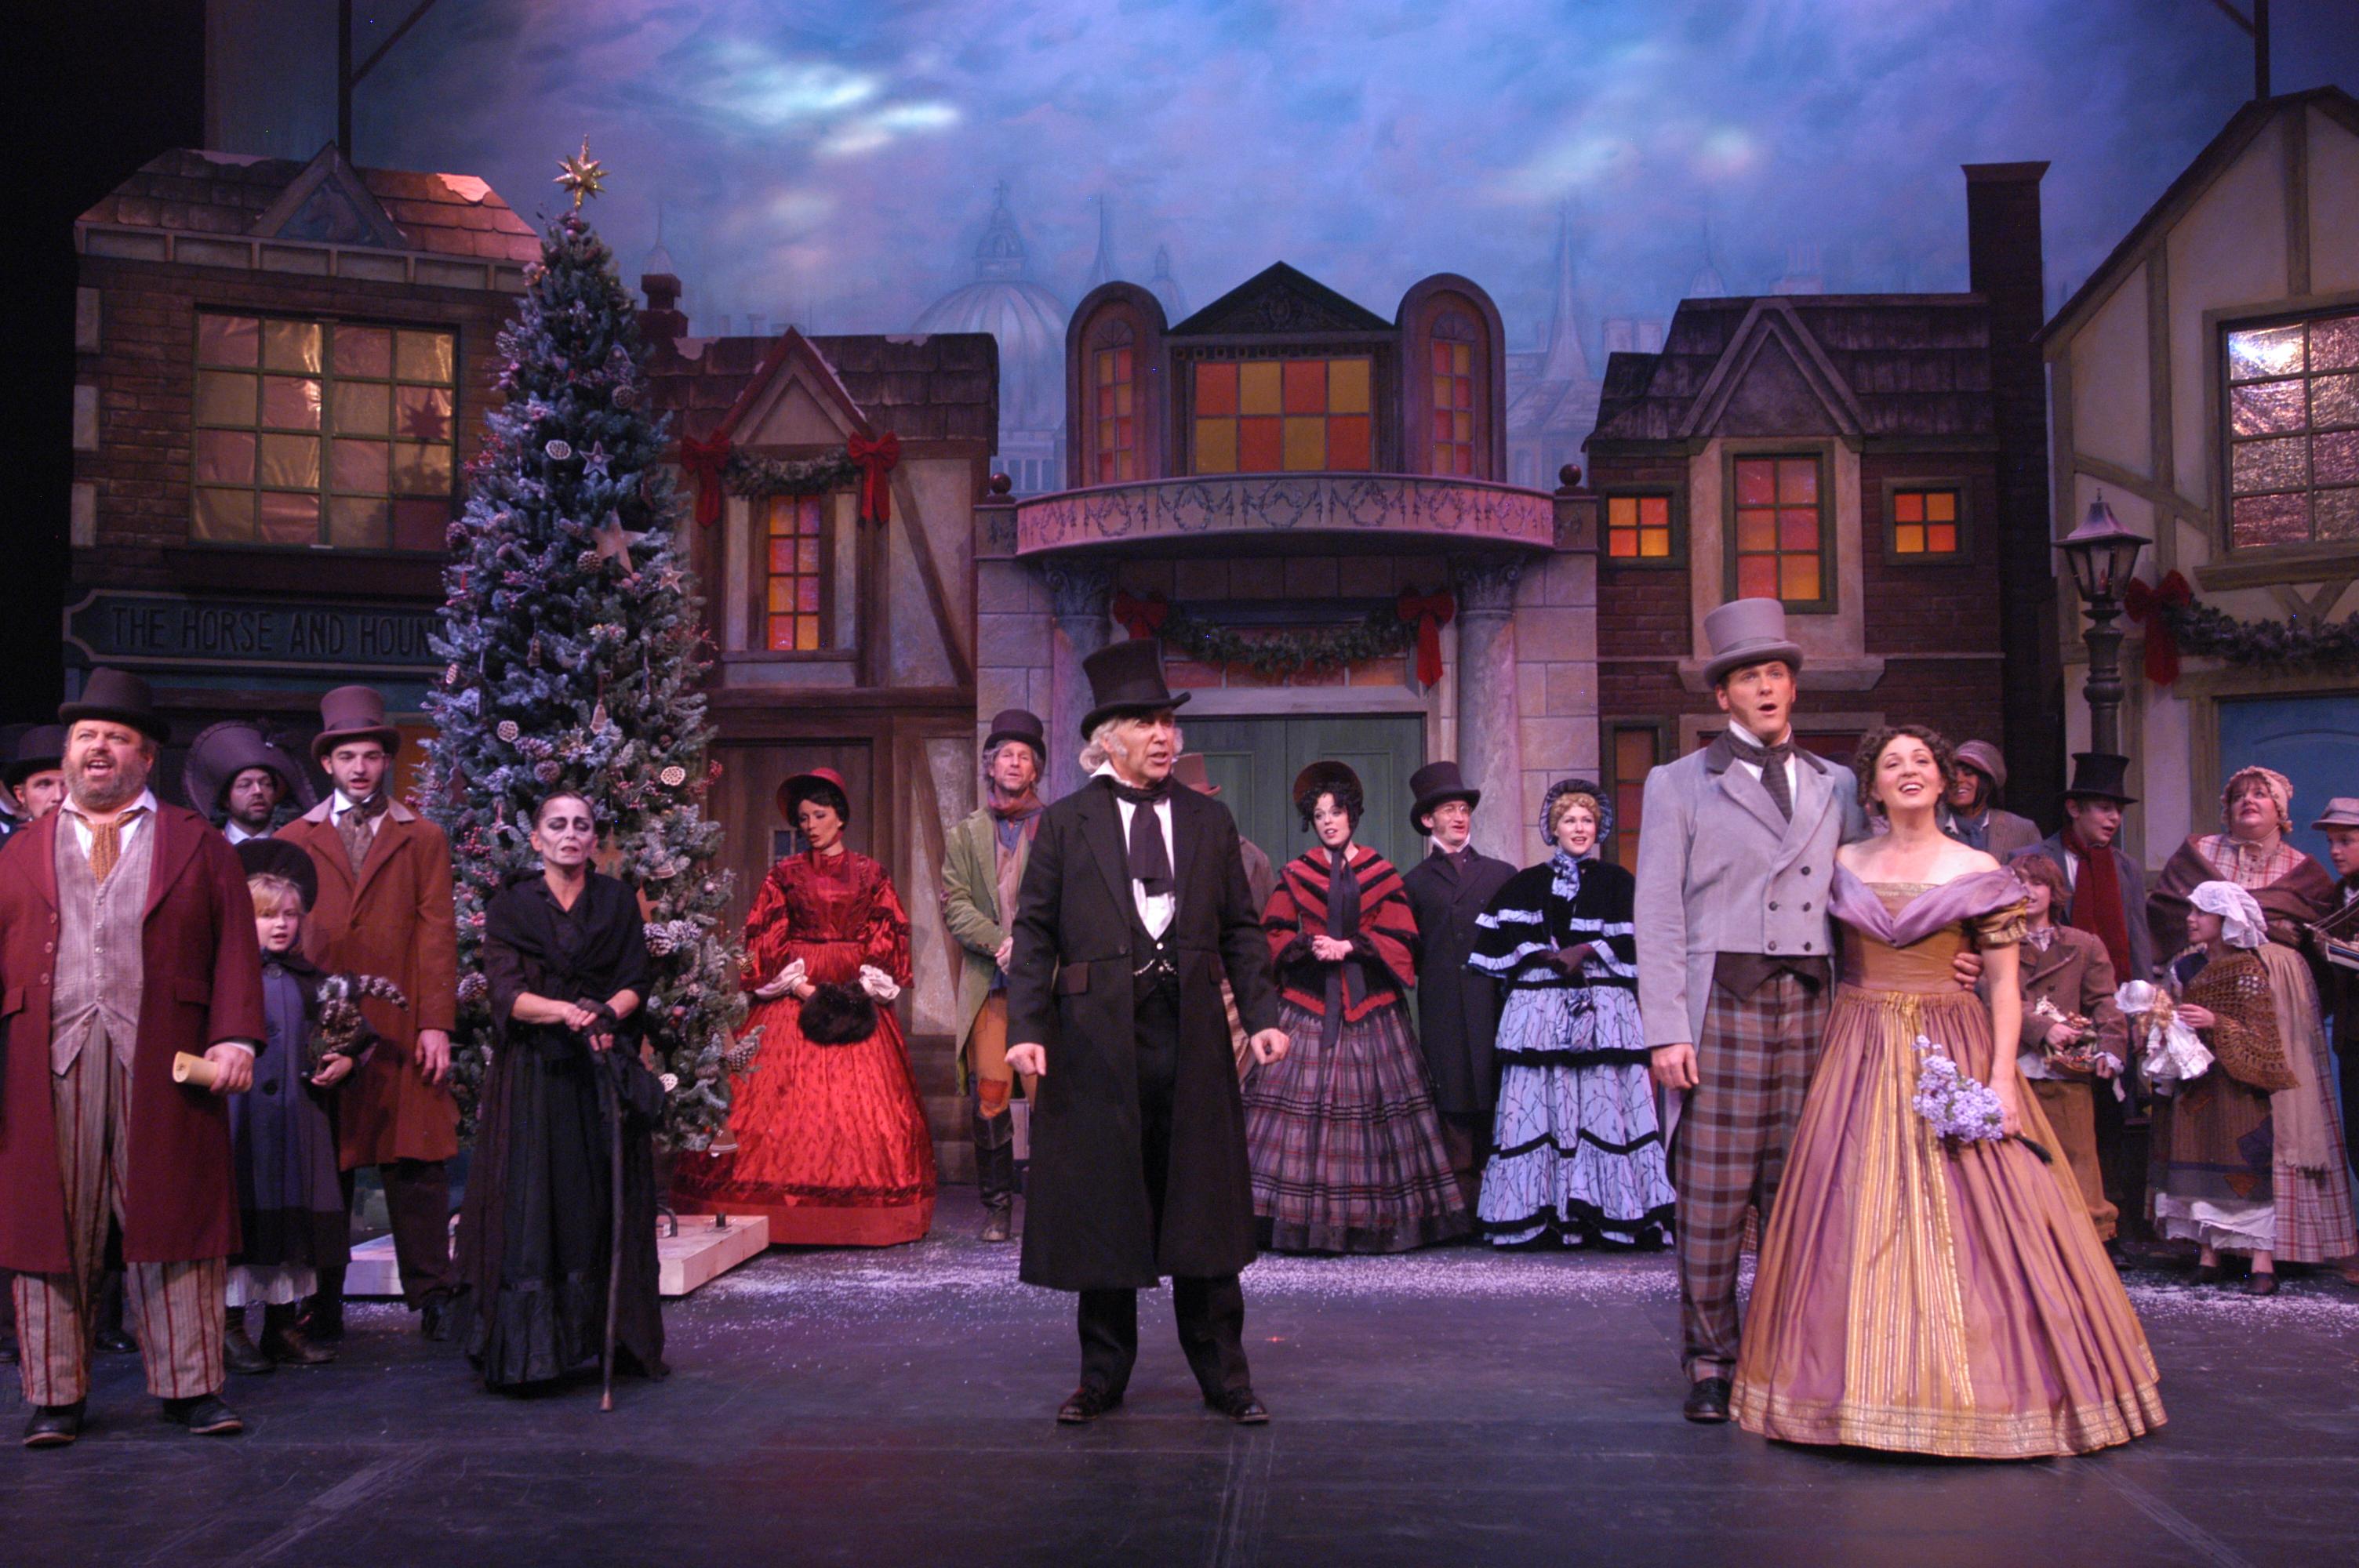 ... up A Christmas Carol with Musical | He Said/She Said Critiques